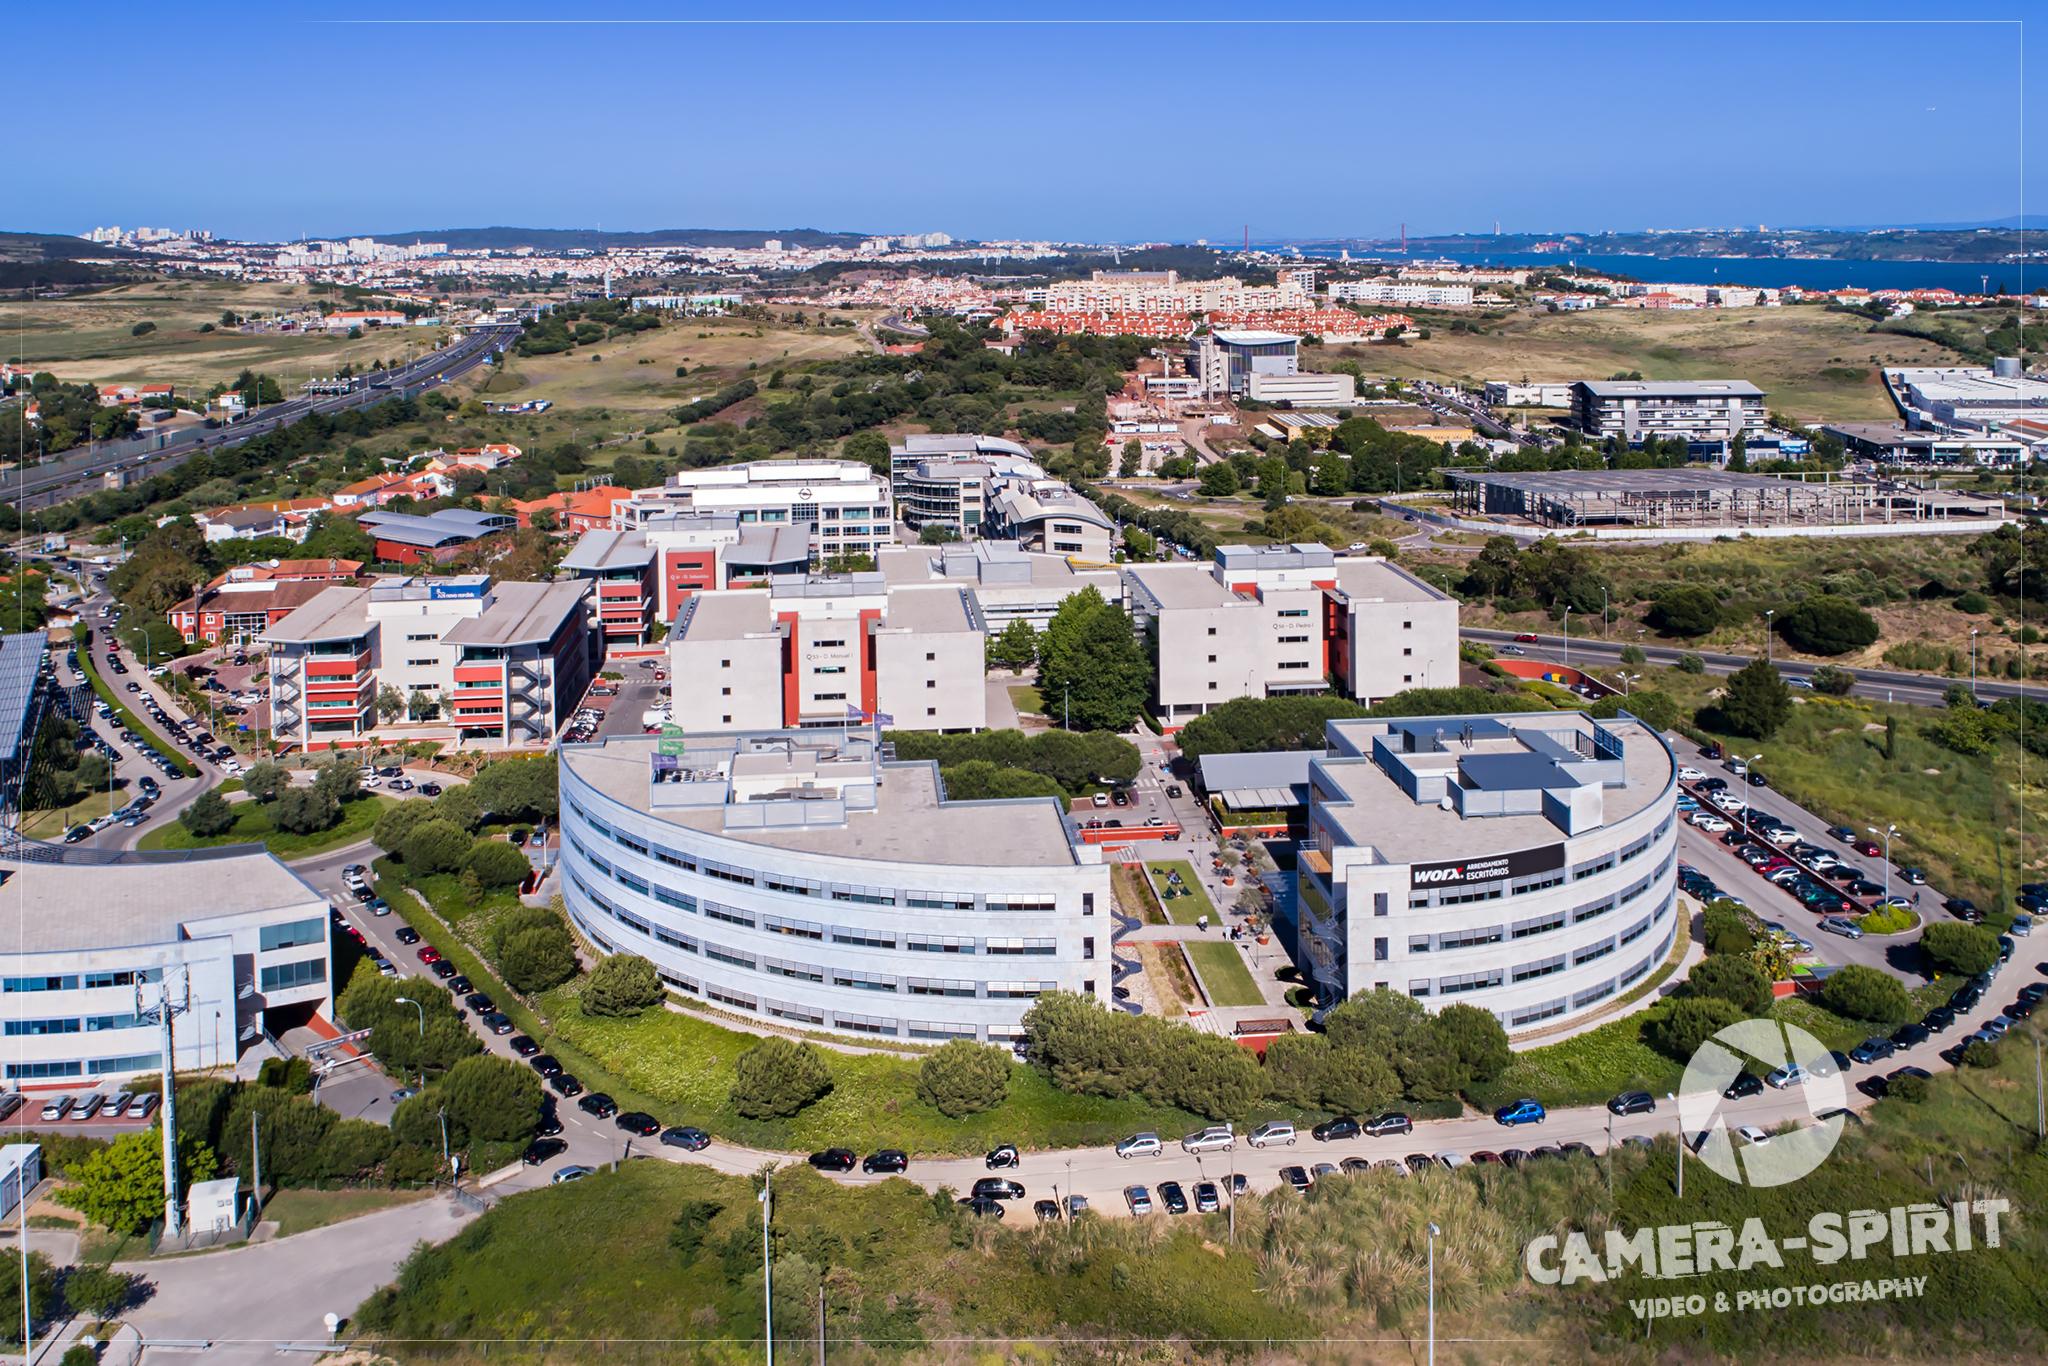 AerialPhotography_Proj011_Photos04_PedroLima